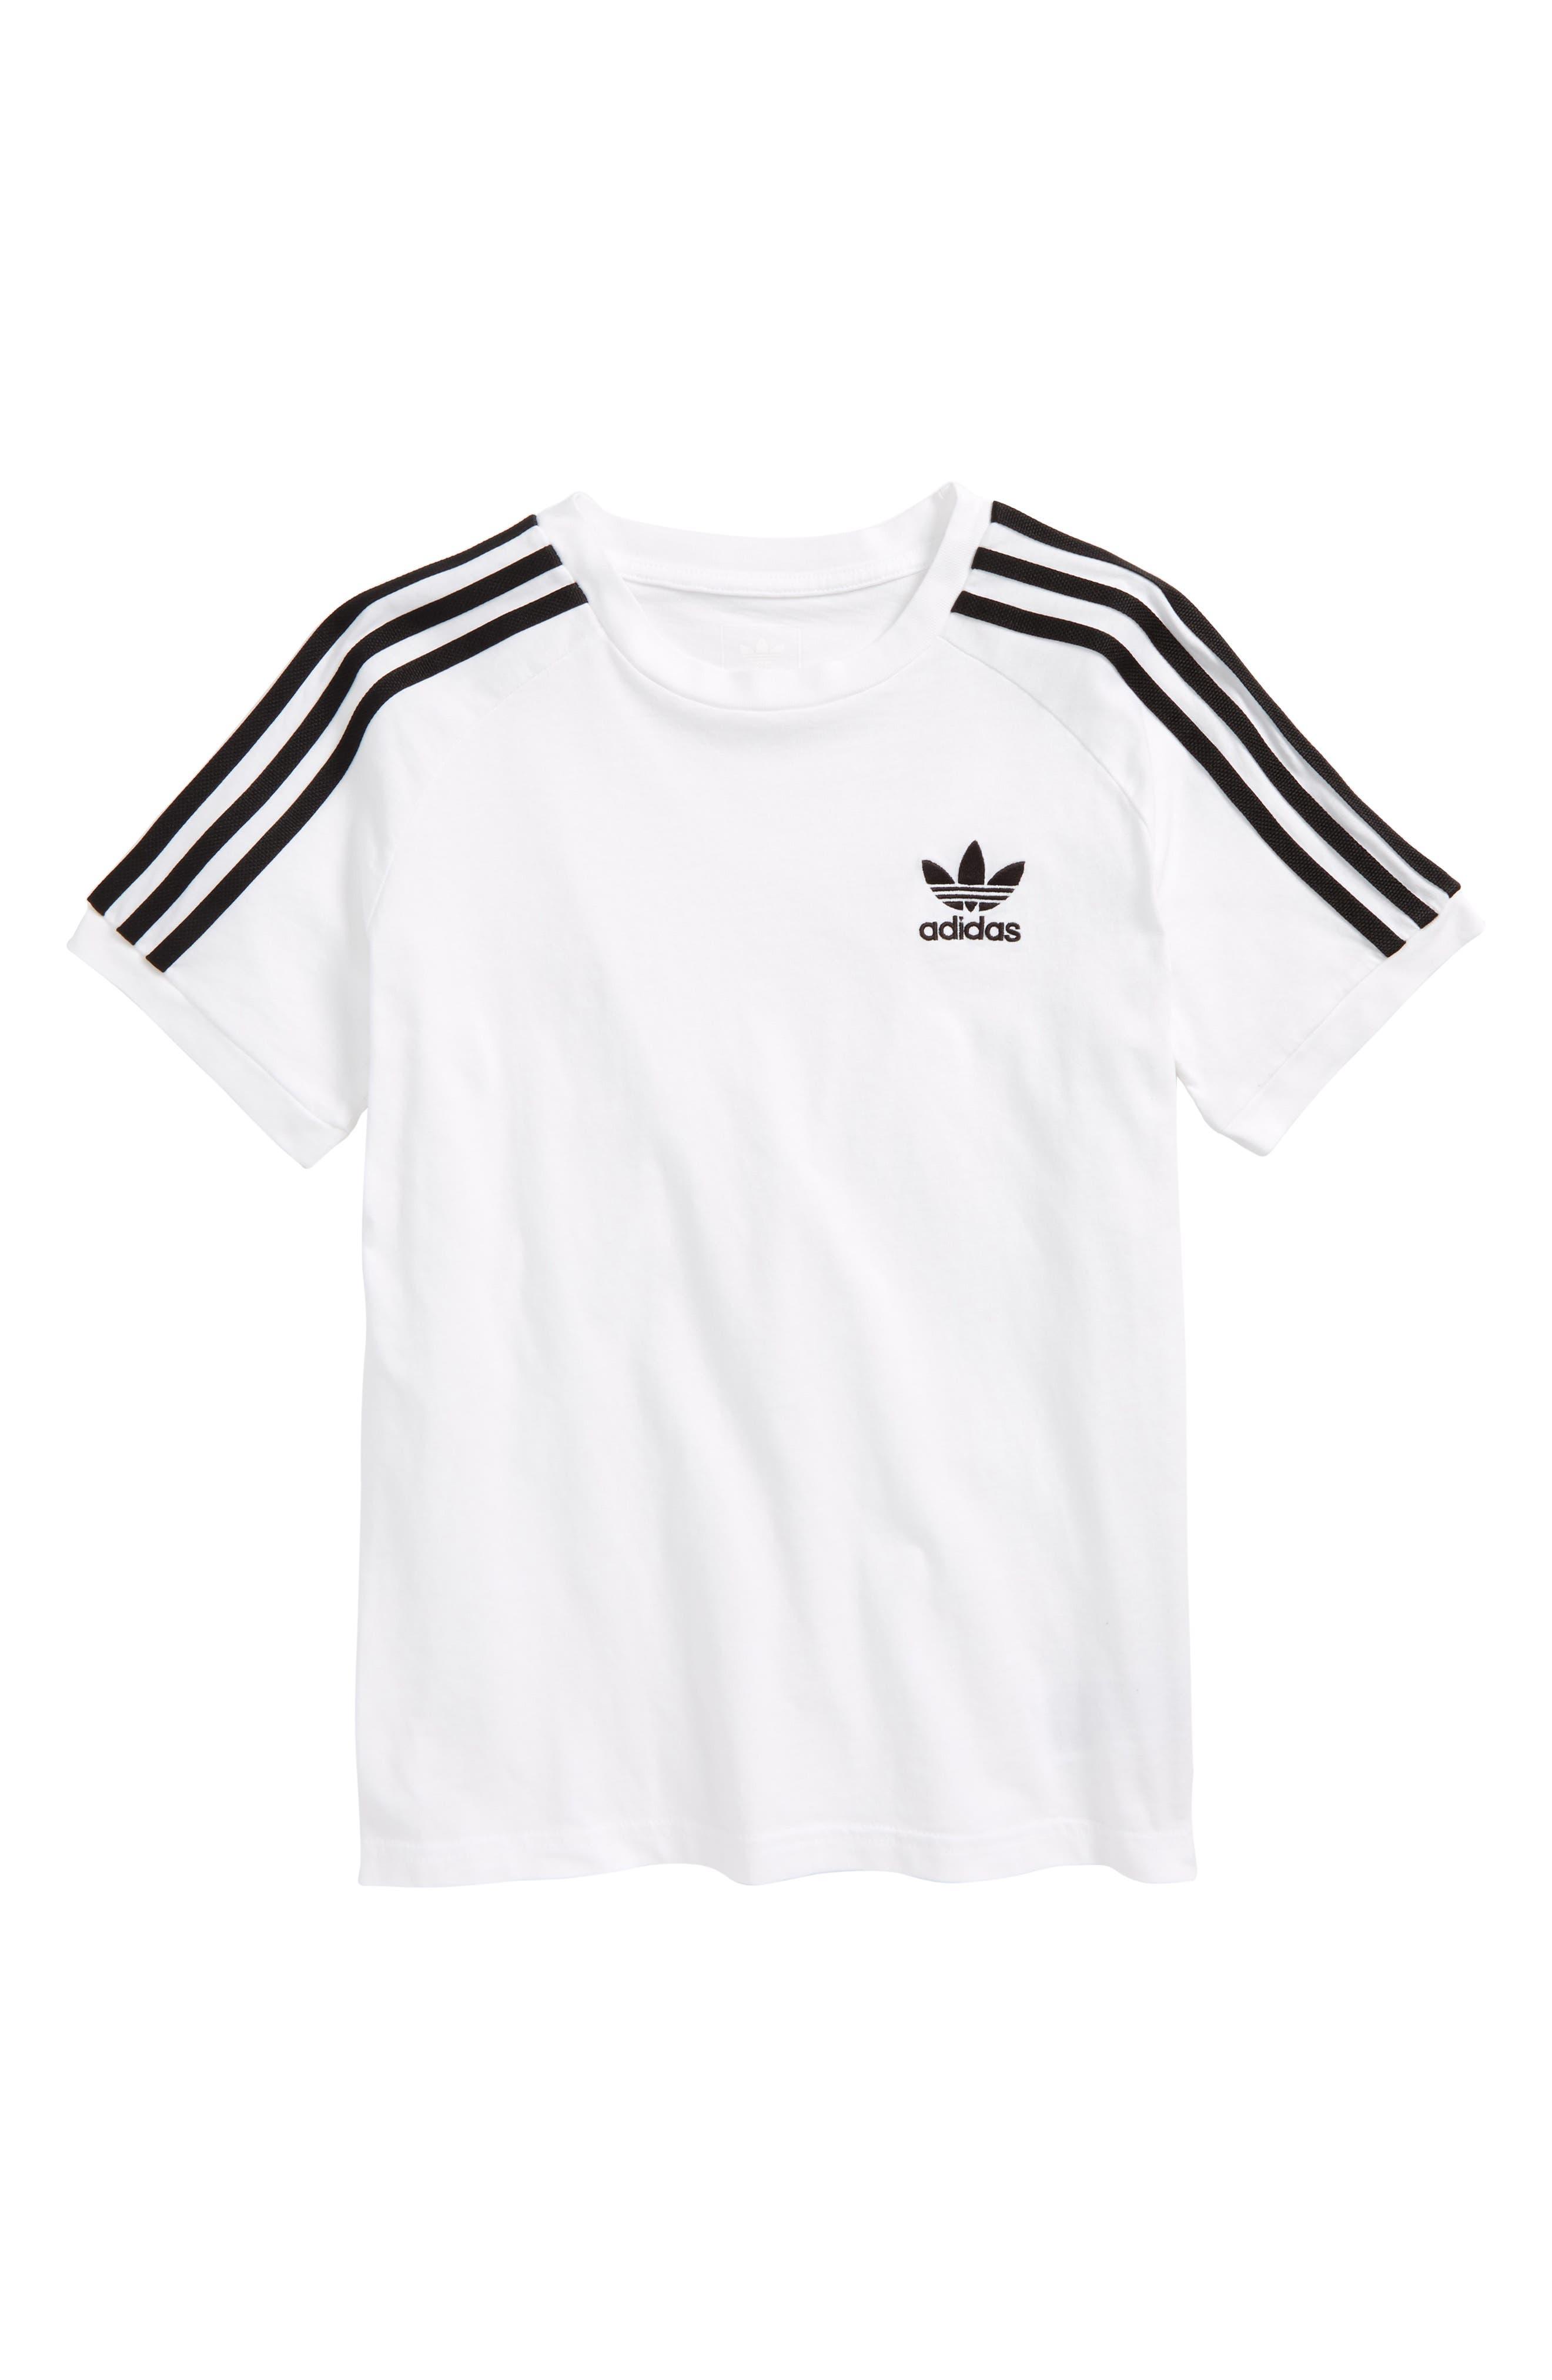 d66511da0a97 adidas for Kids T-Shirts  Activewear   Shoes